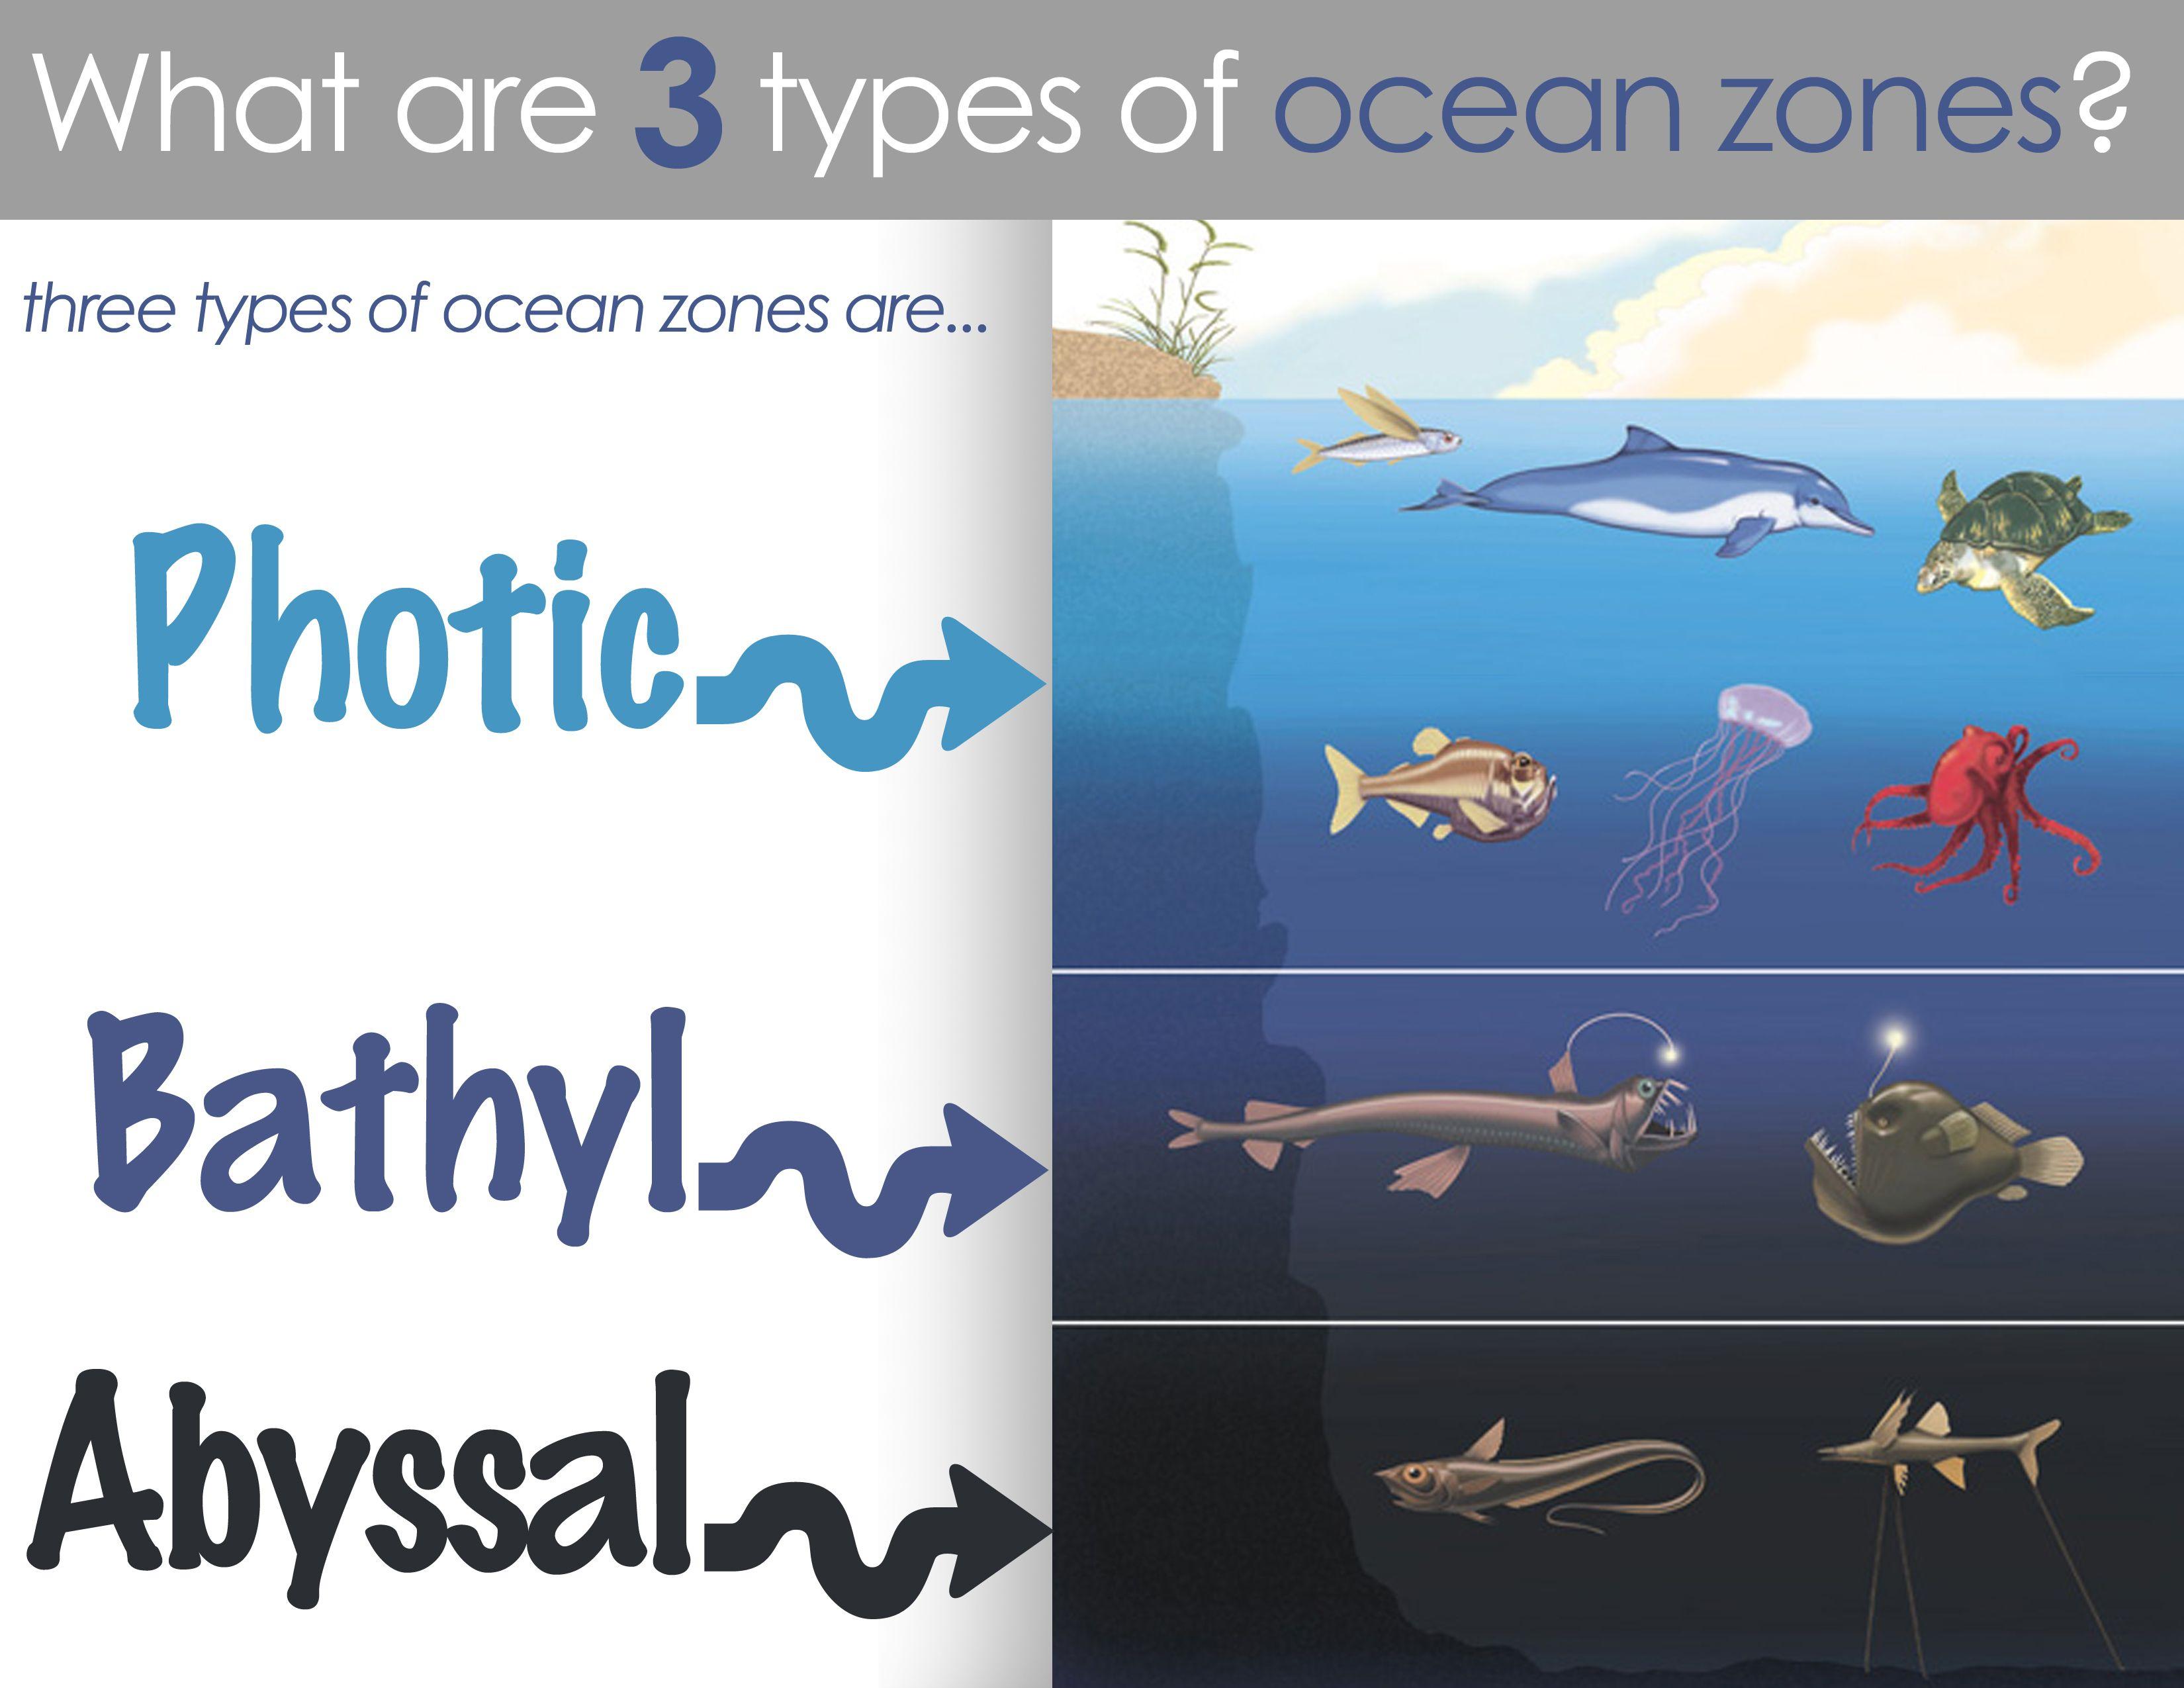 Classical conversations cycle 1 science week 19 ocean zones classical conversations cycle 1 science week 19 ocean zones sciox Images